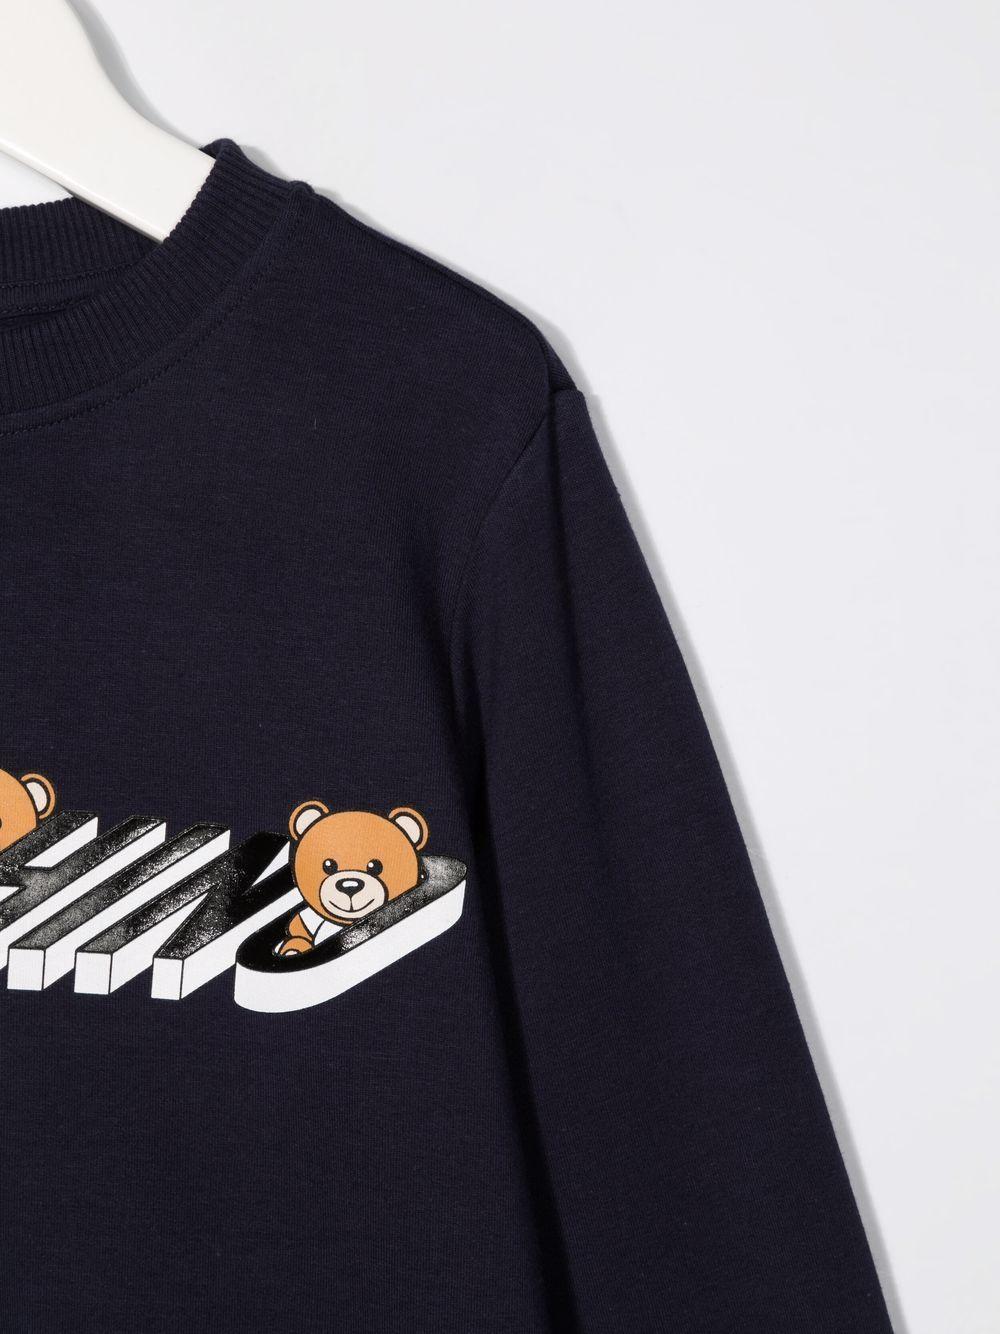 MOSCHINO KIDS | Sweatshirt | HUF05LLDA1840016